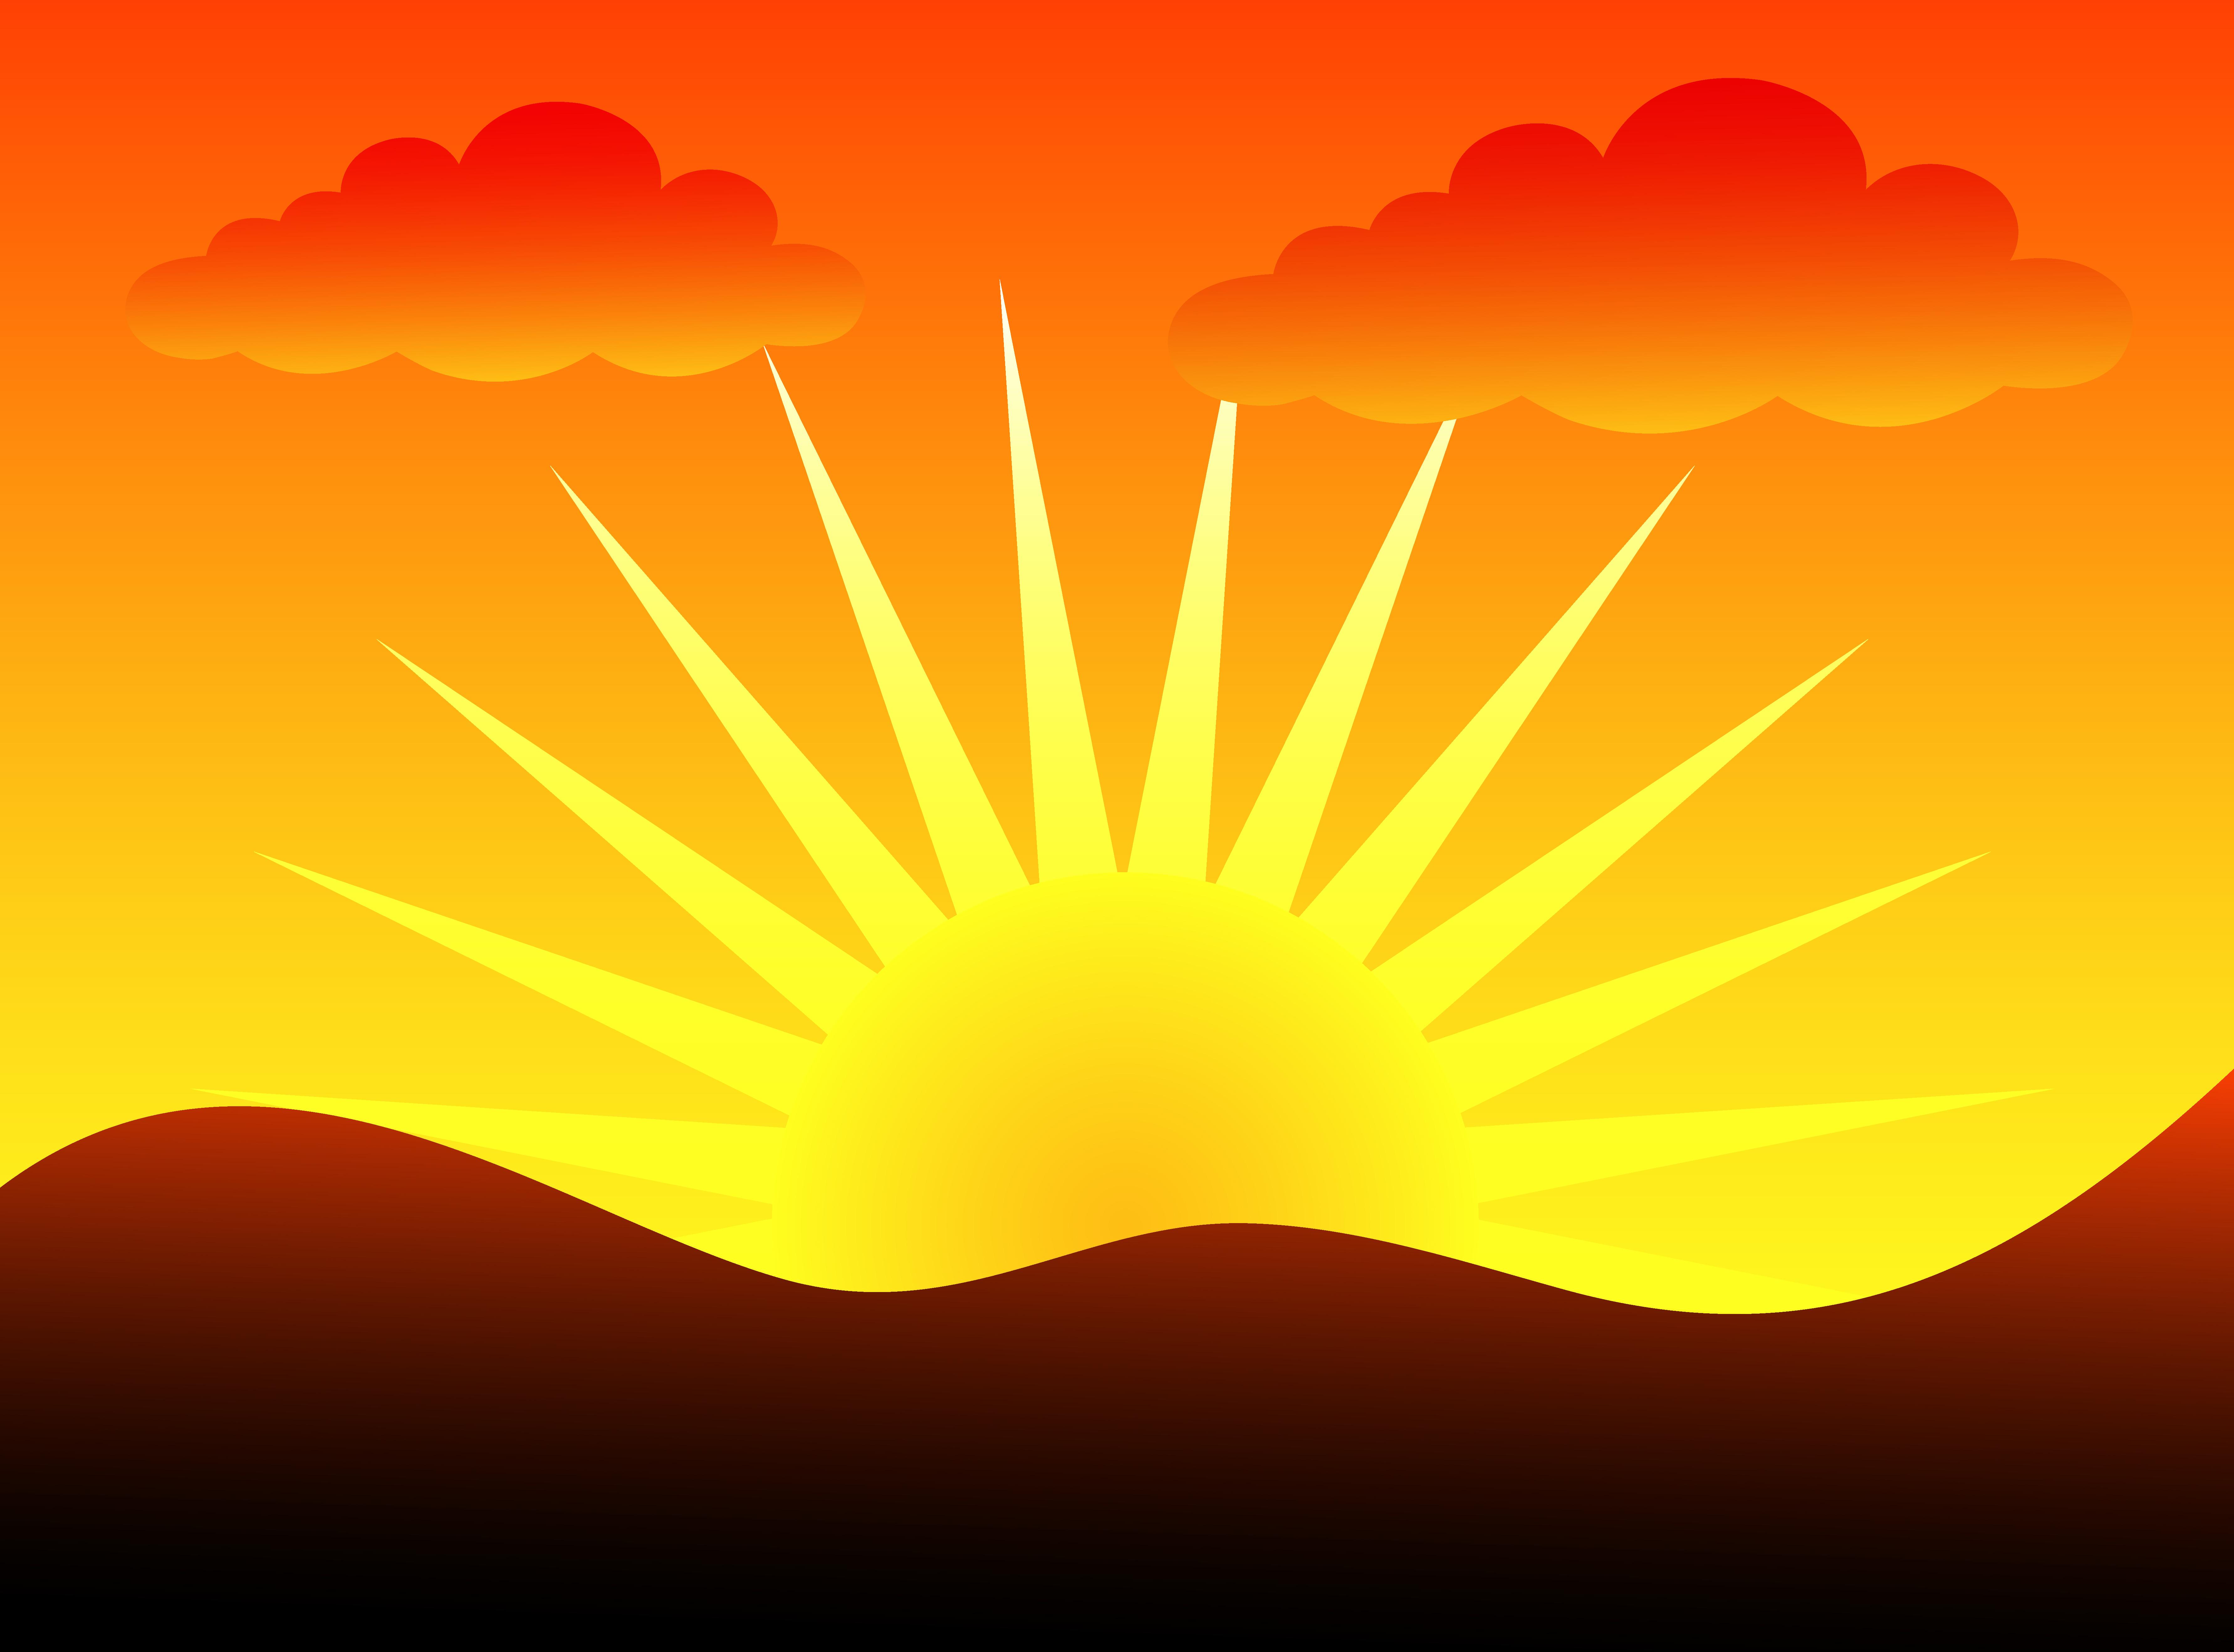 Sunrise Clipart.